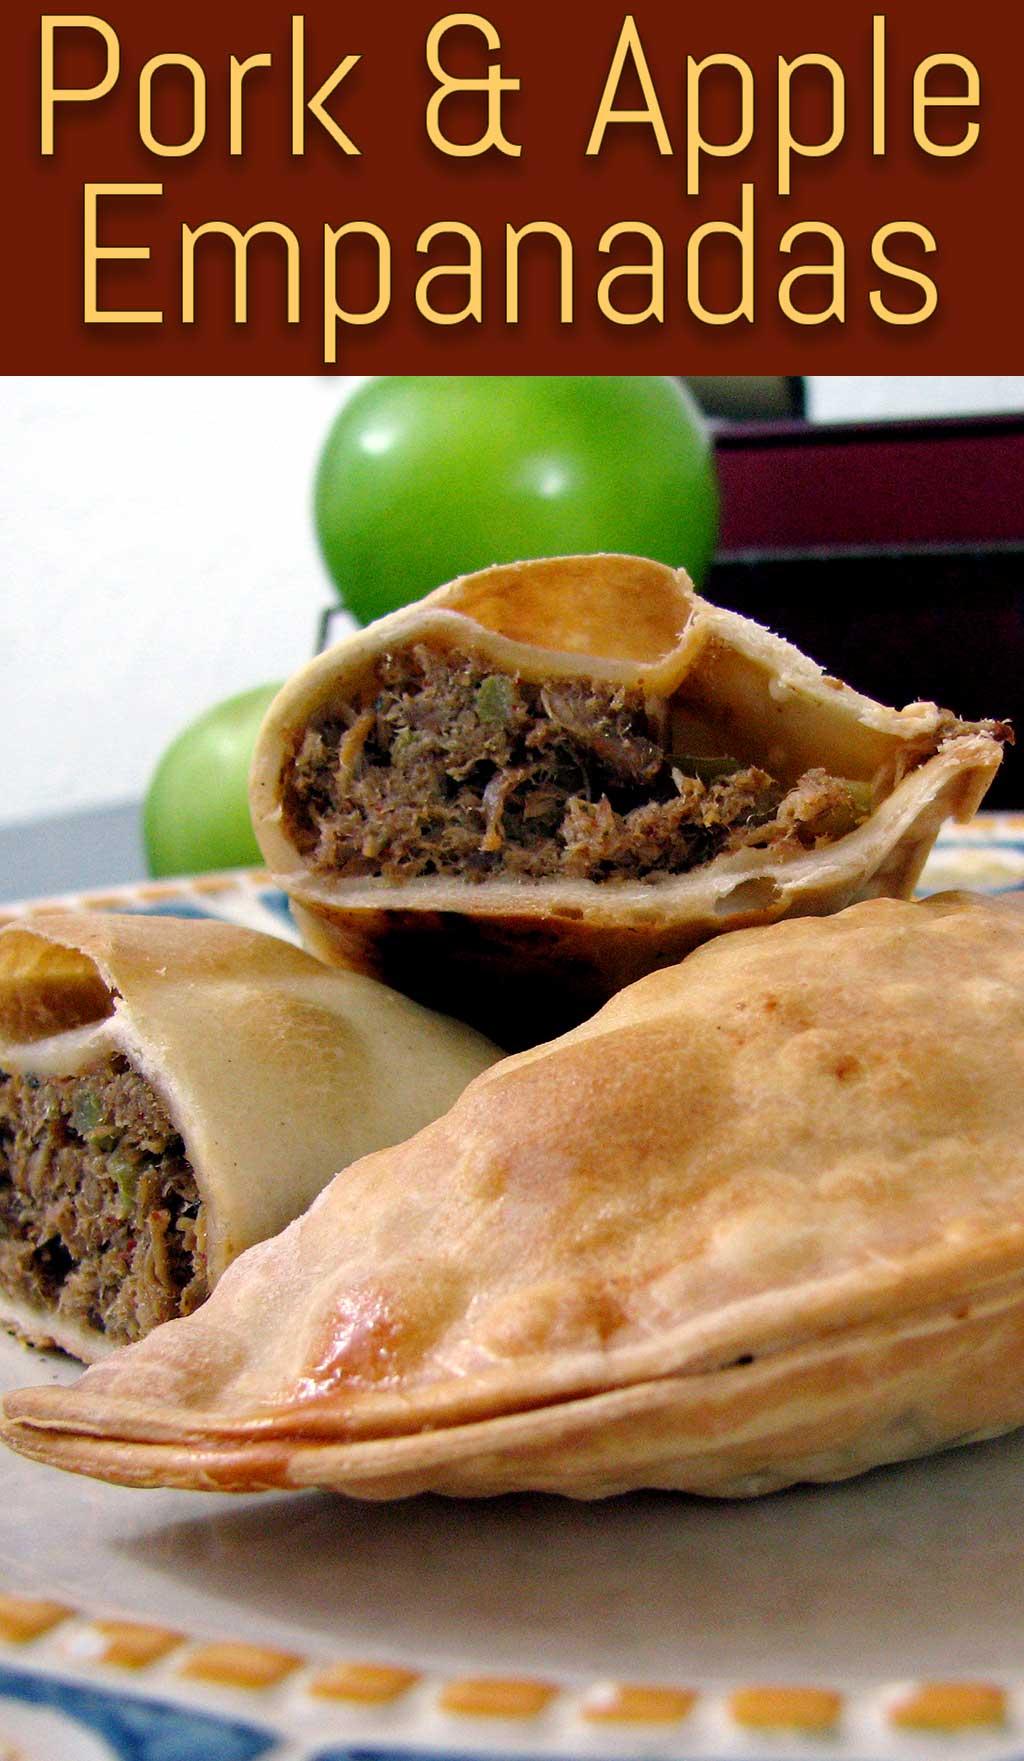 Pork & Apple Empanadas, A twist on a classic empanada recipe